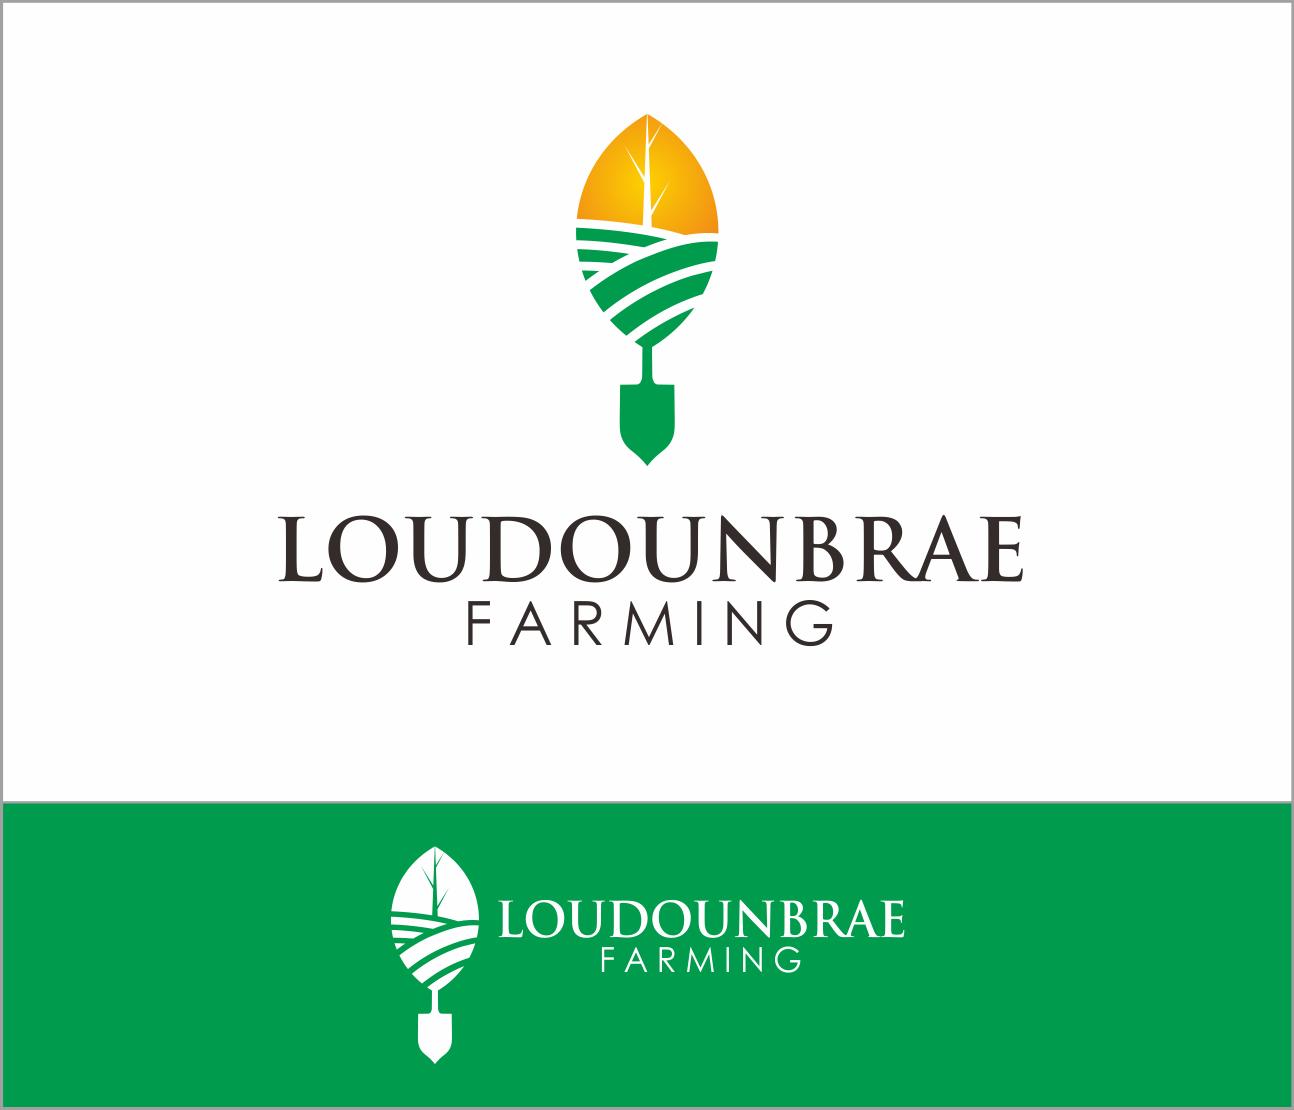 Logo Design by Armada Jamaluddin - Entry No. 69 in the Logo Design Contest Creative Logo Design for Loudounbrae Farming.